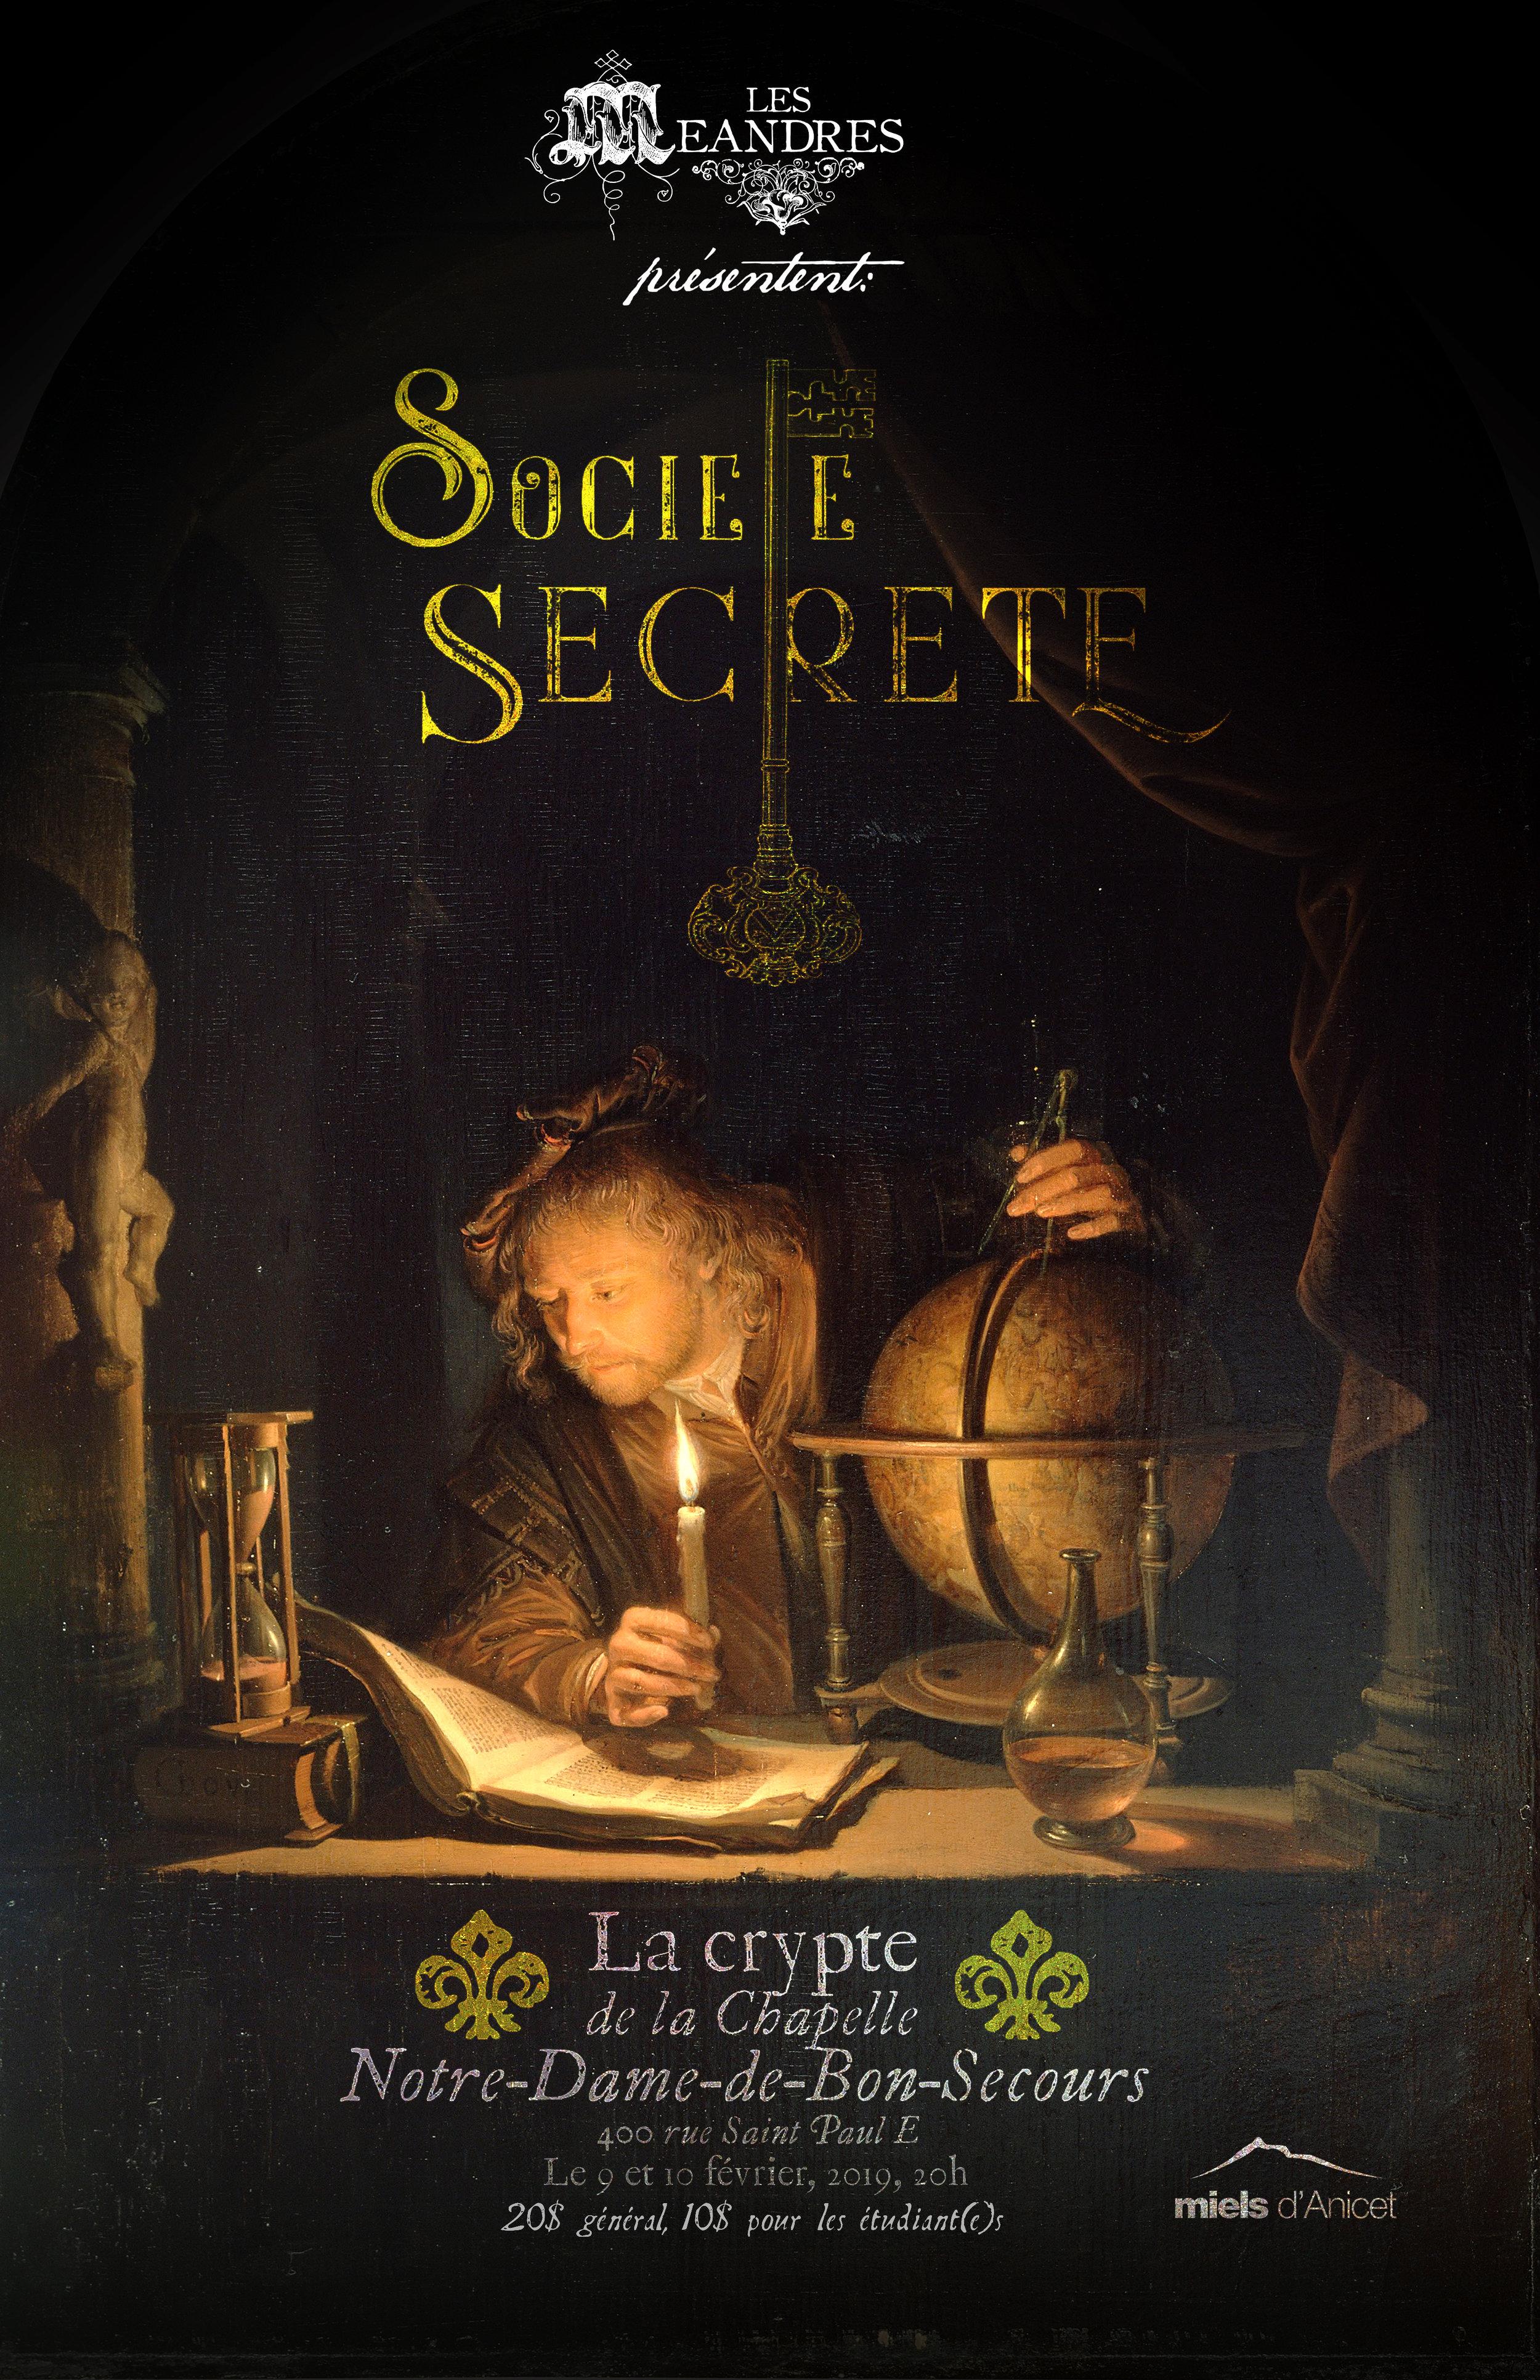 La Societe Secrete poster final.jpg